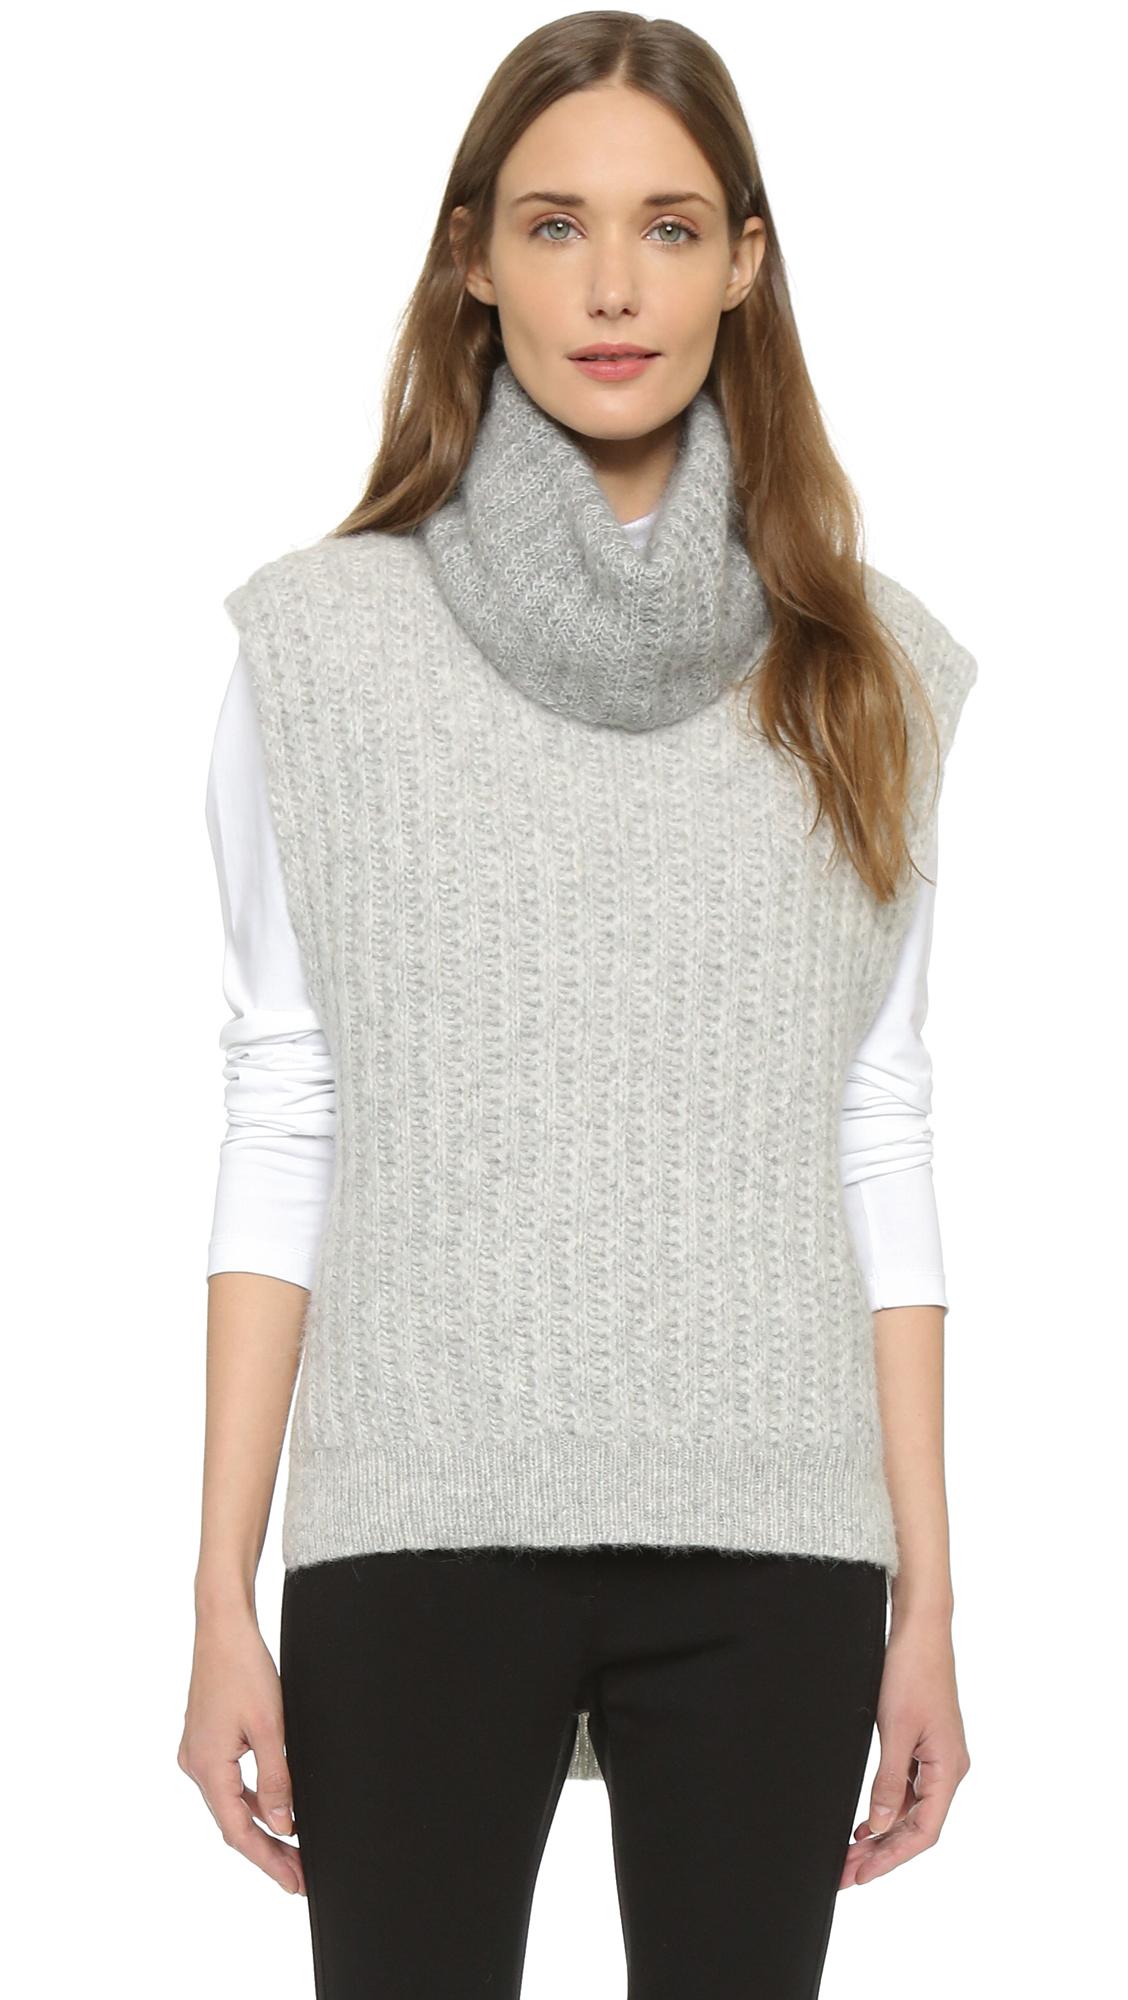 3.1 phillip lim Turtleneck Sweater Vest in Gray | Lyst